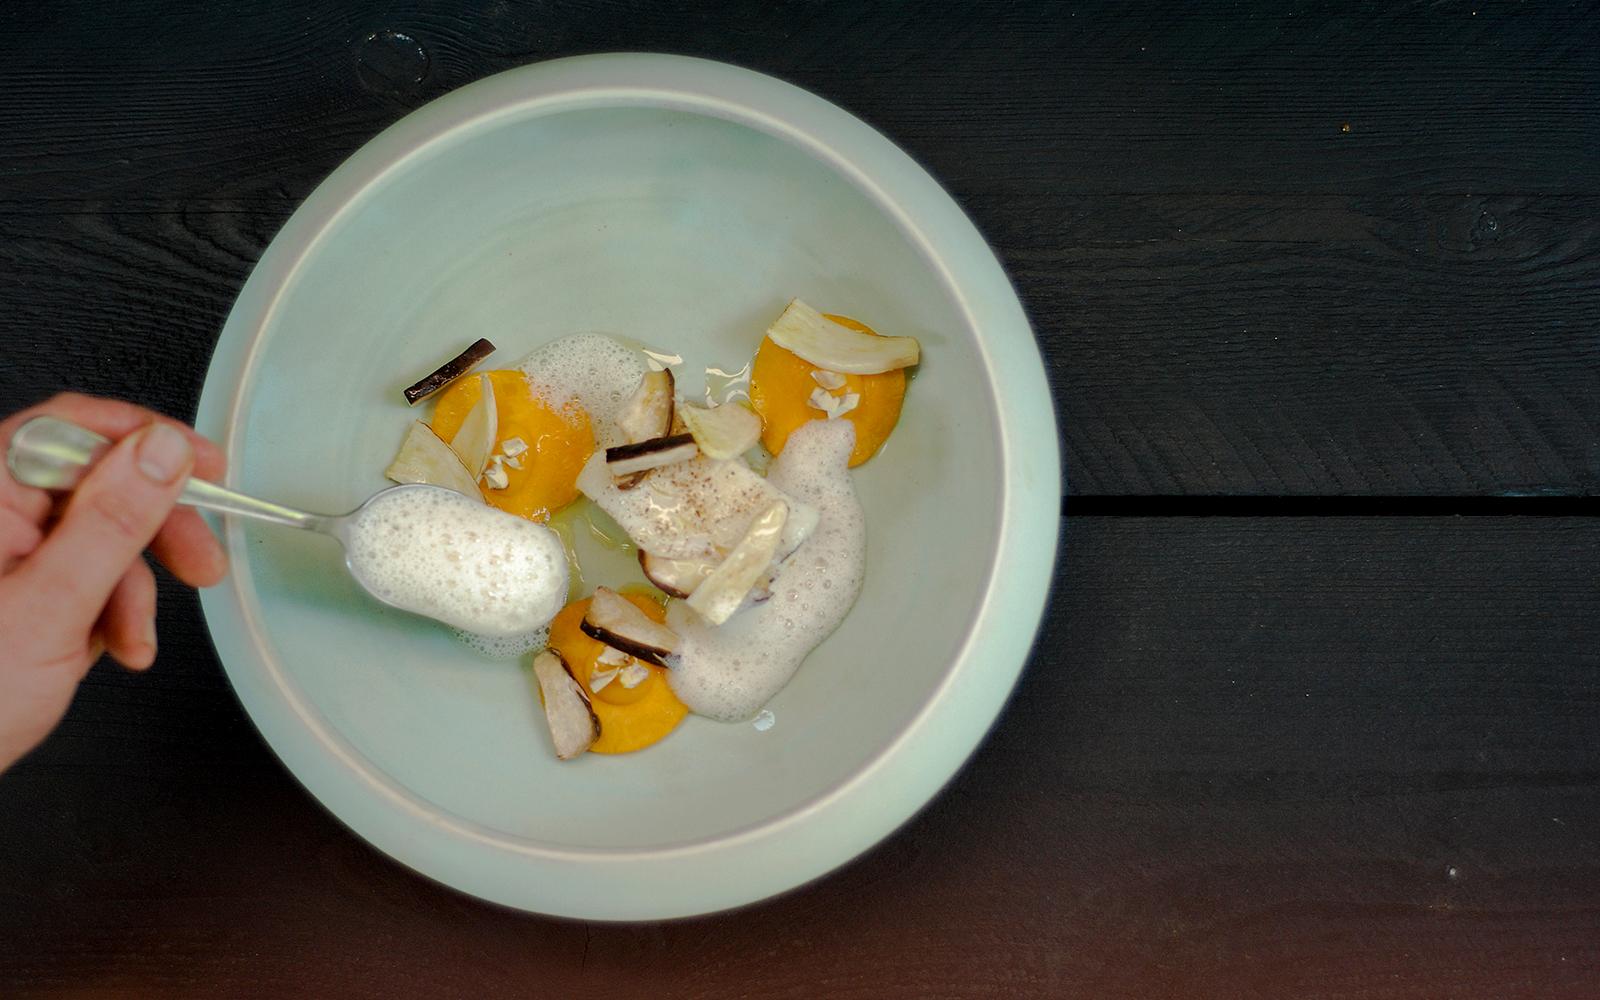 Vis met paddenstoelen Ysbrandt Wermenbol, restaurant Lime